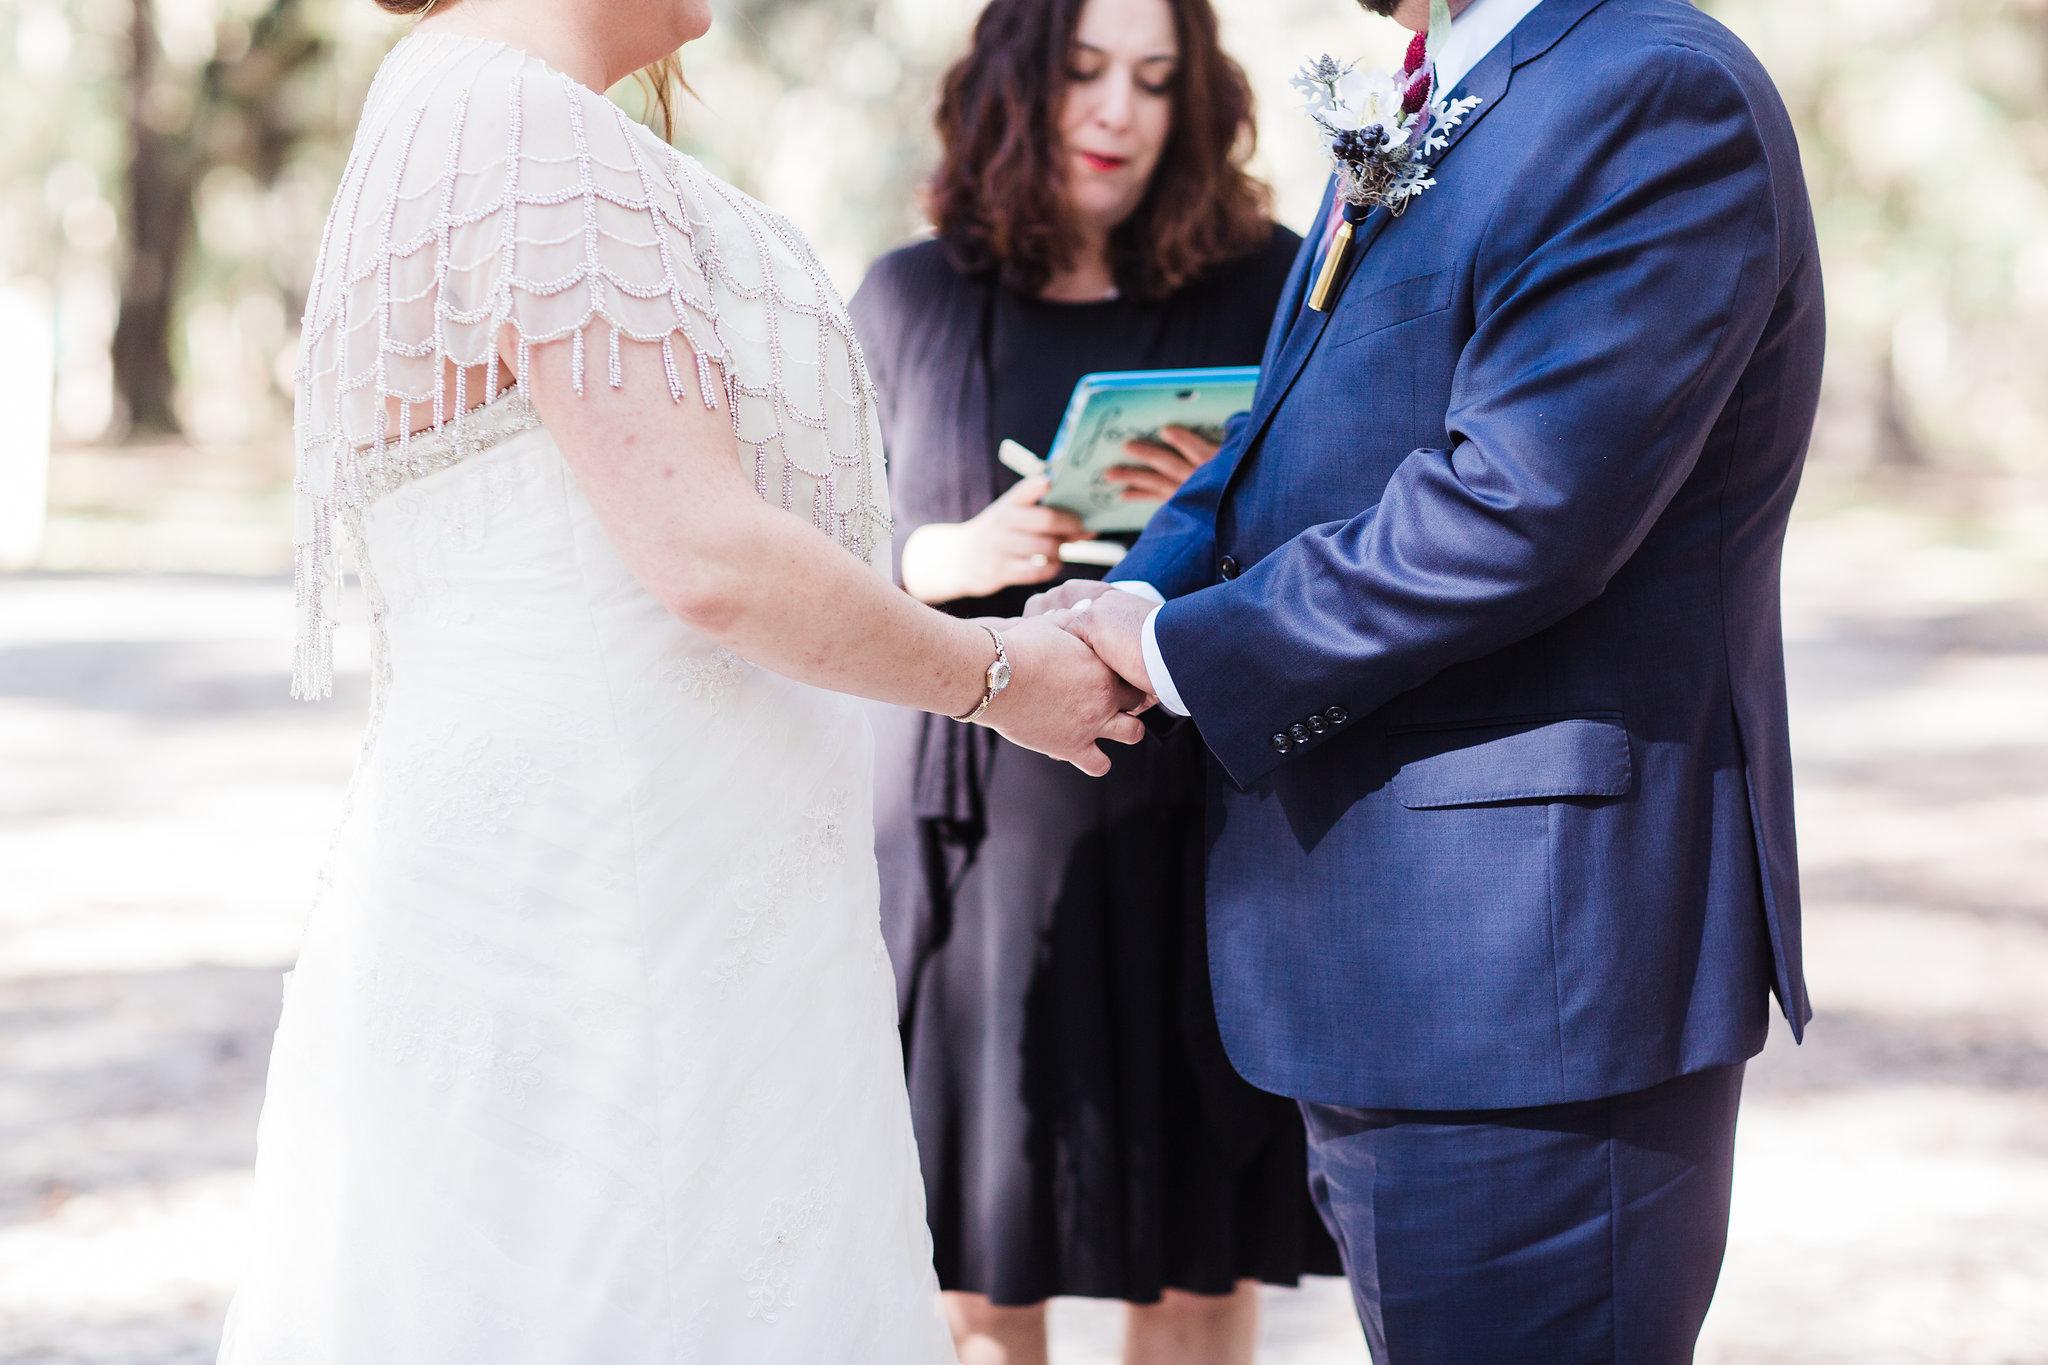 apt-b-photography-kristy-rob-wormsloe-elopment-savannah-wedding-photographer-savannah-elopement-wormsloe-wedding-historic-savannah-elopement-photographer-18.jpg